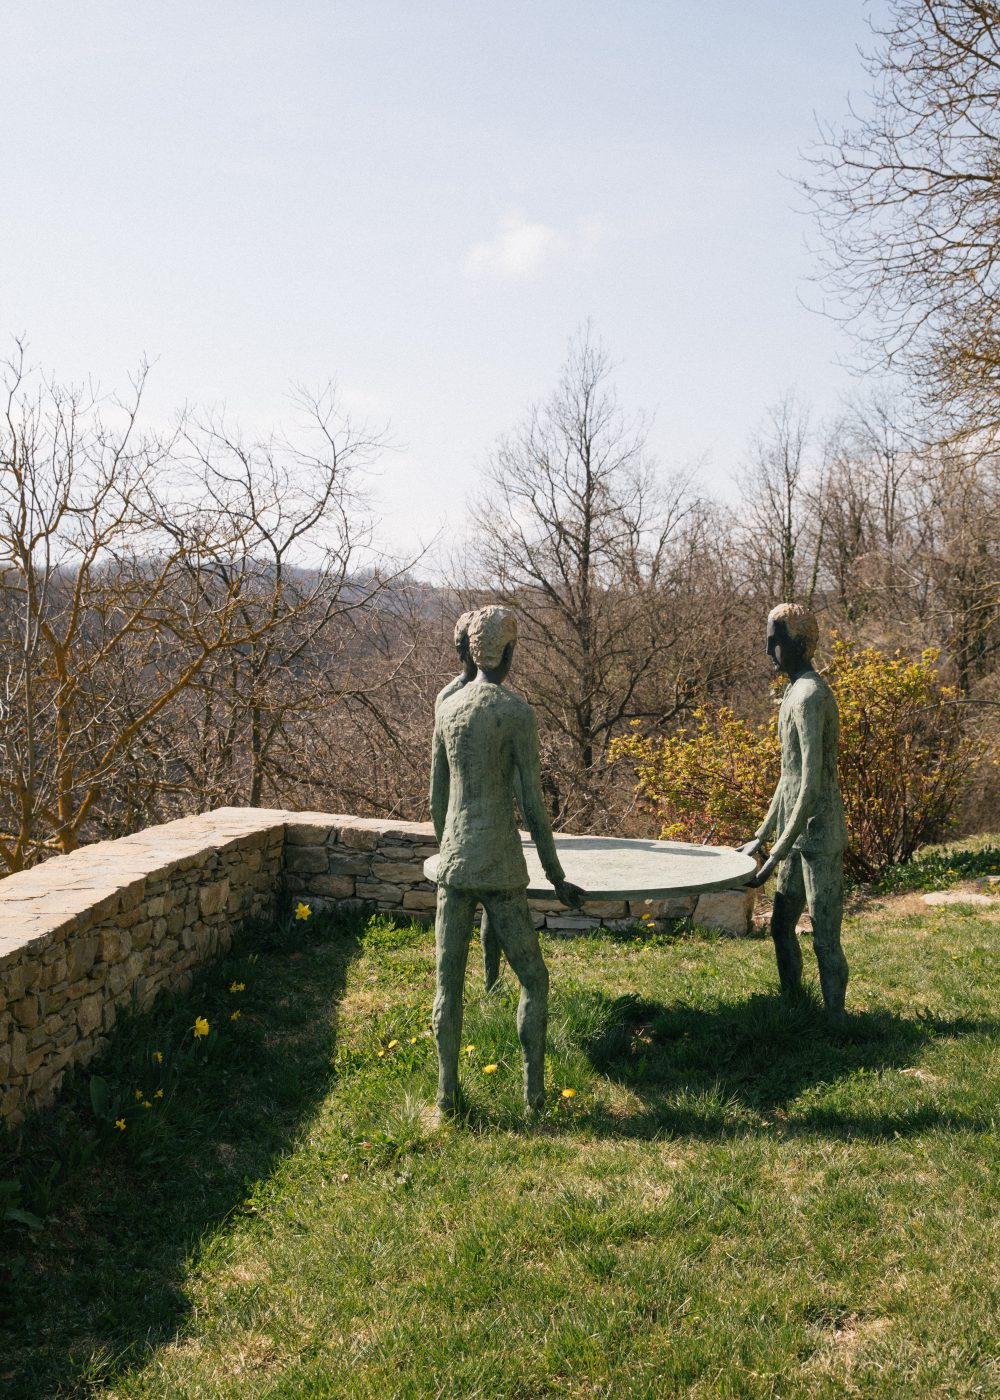 Francesco Pistoi - Musica Segreta is a conceptual project of photojournalism, sound, and storytelling by Letizia Cigliutti and Amanda Courtney.